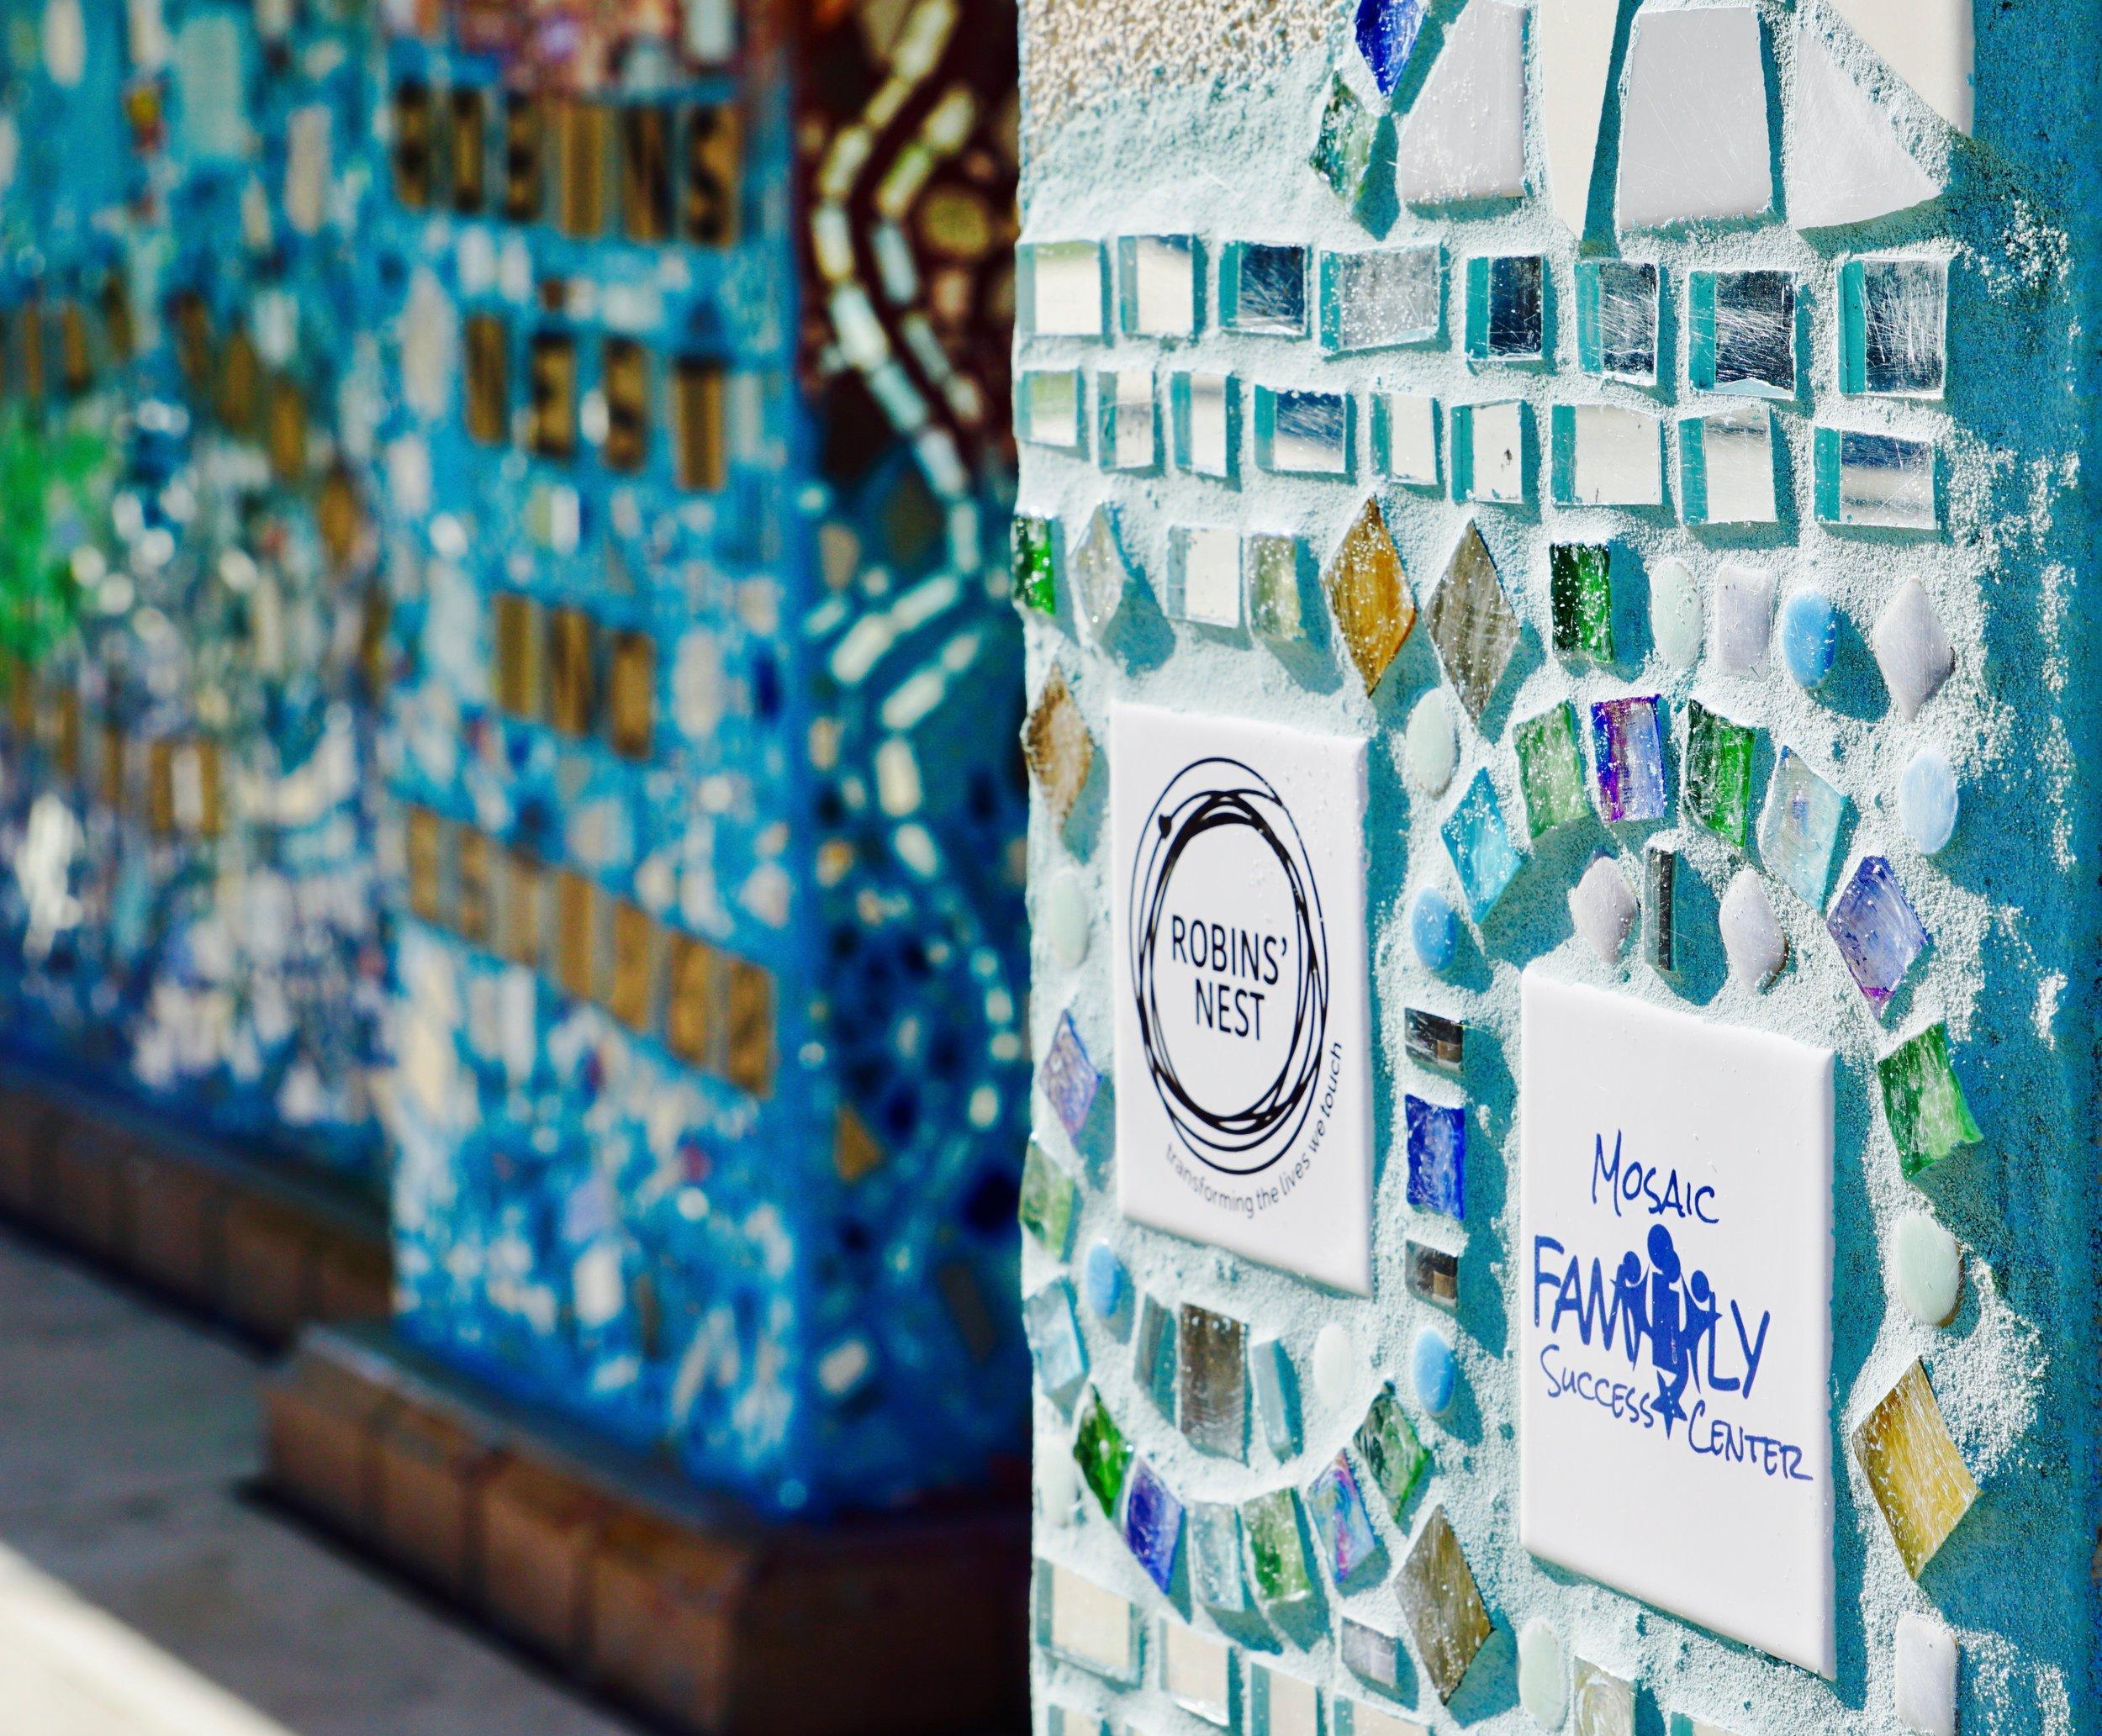 Isaiah Zagar Mosaic Mural for glassboro16.jpg